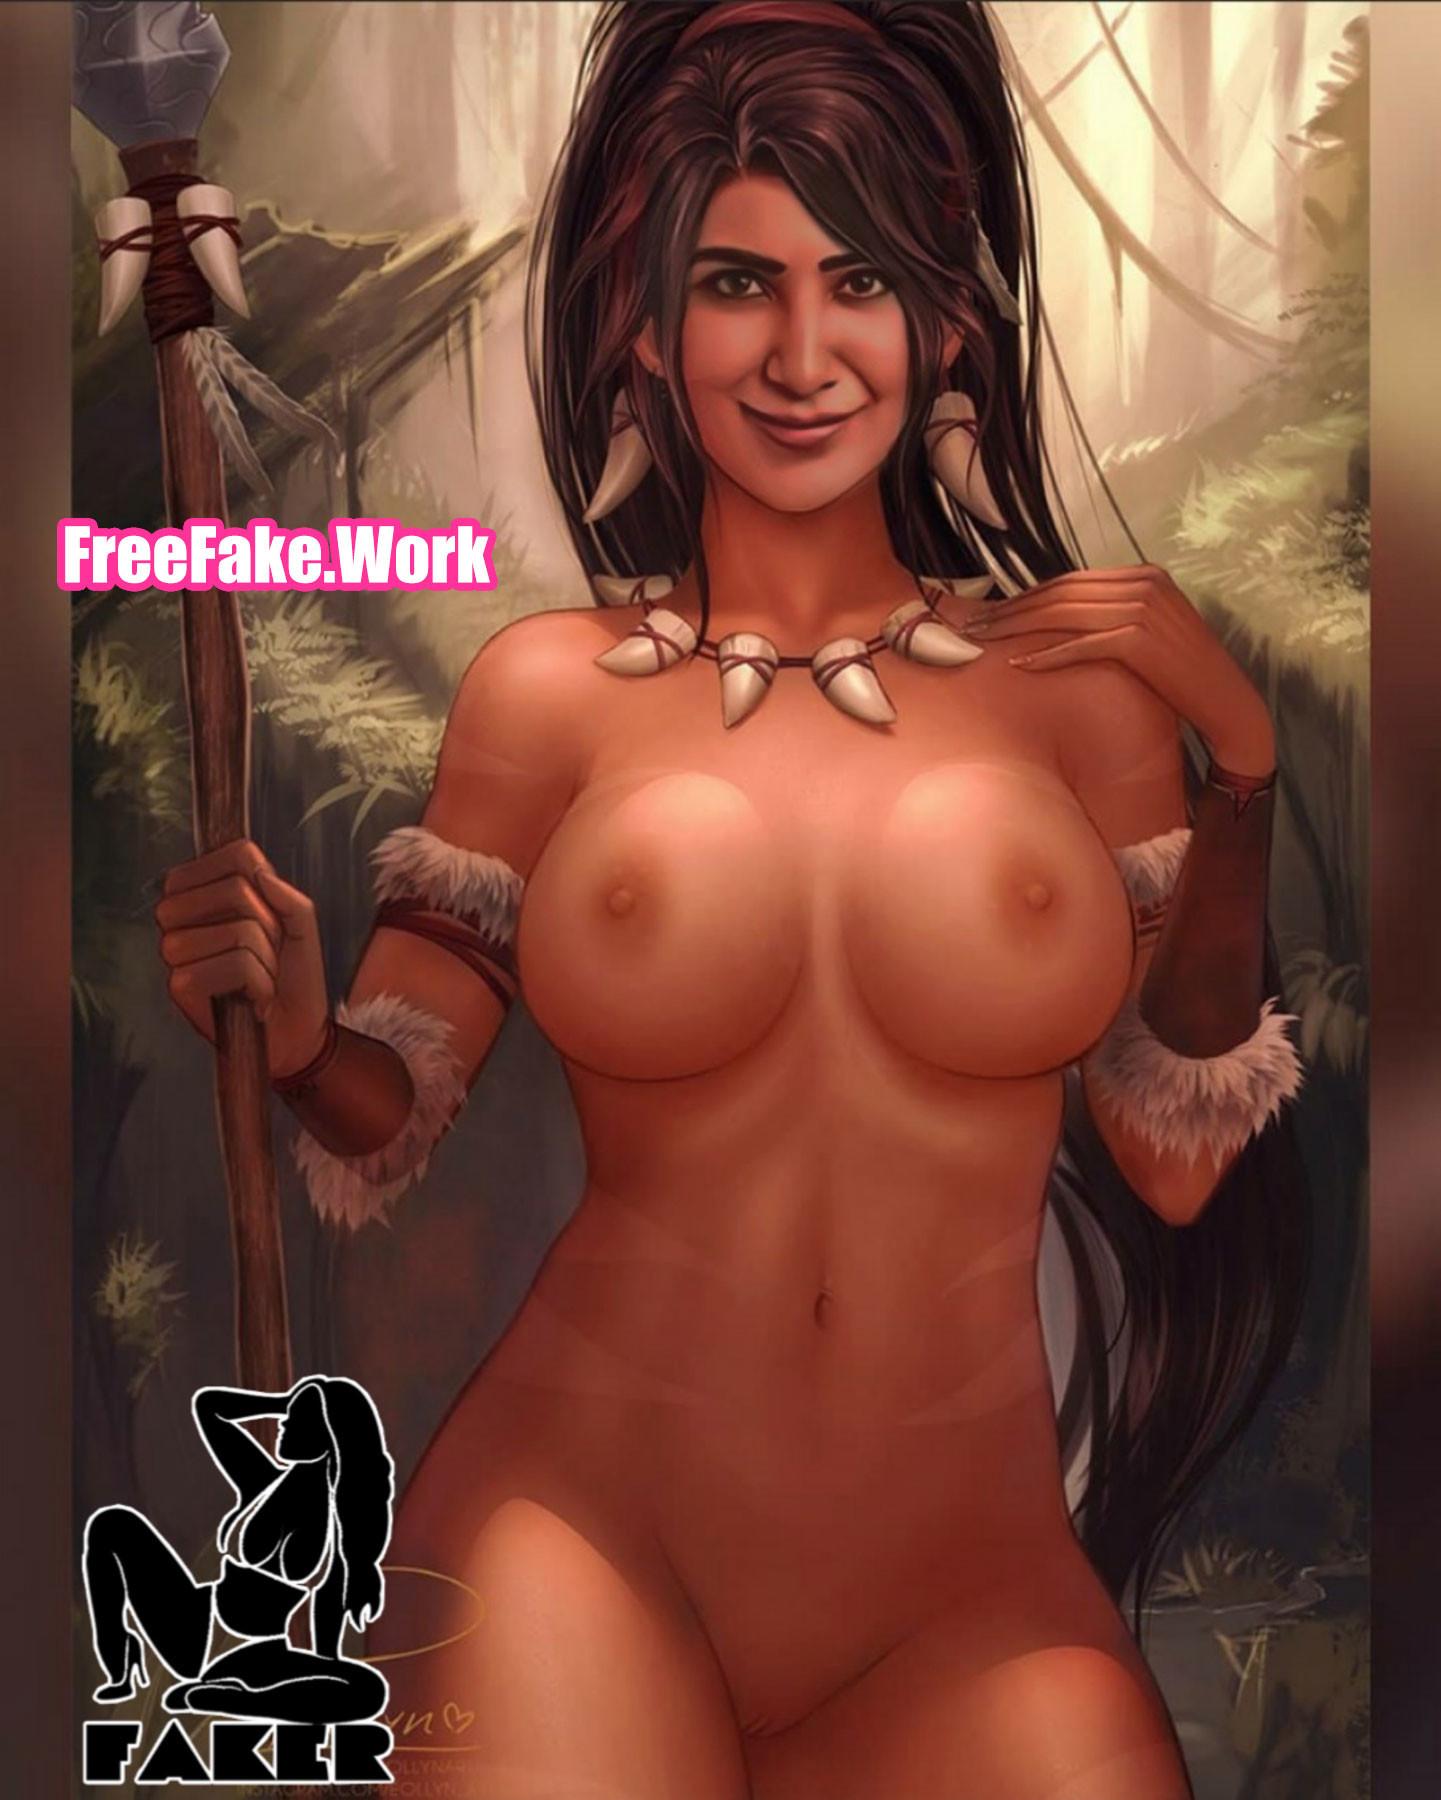 Samantha-Akkineni-sexy-carton-big-boobs-fake-nude-photo.jpg